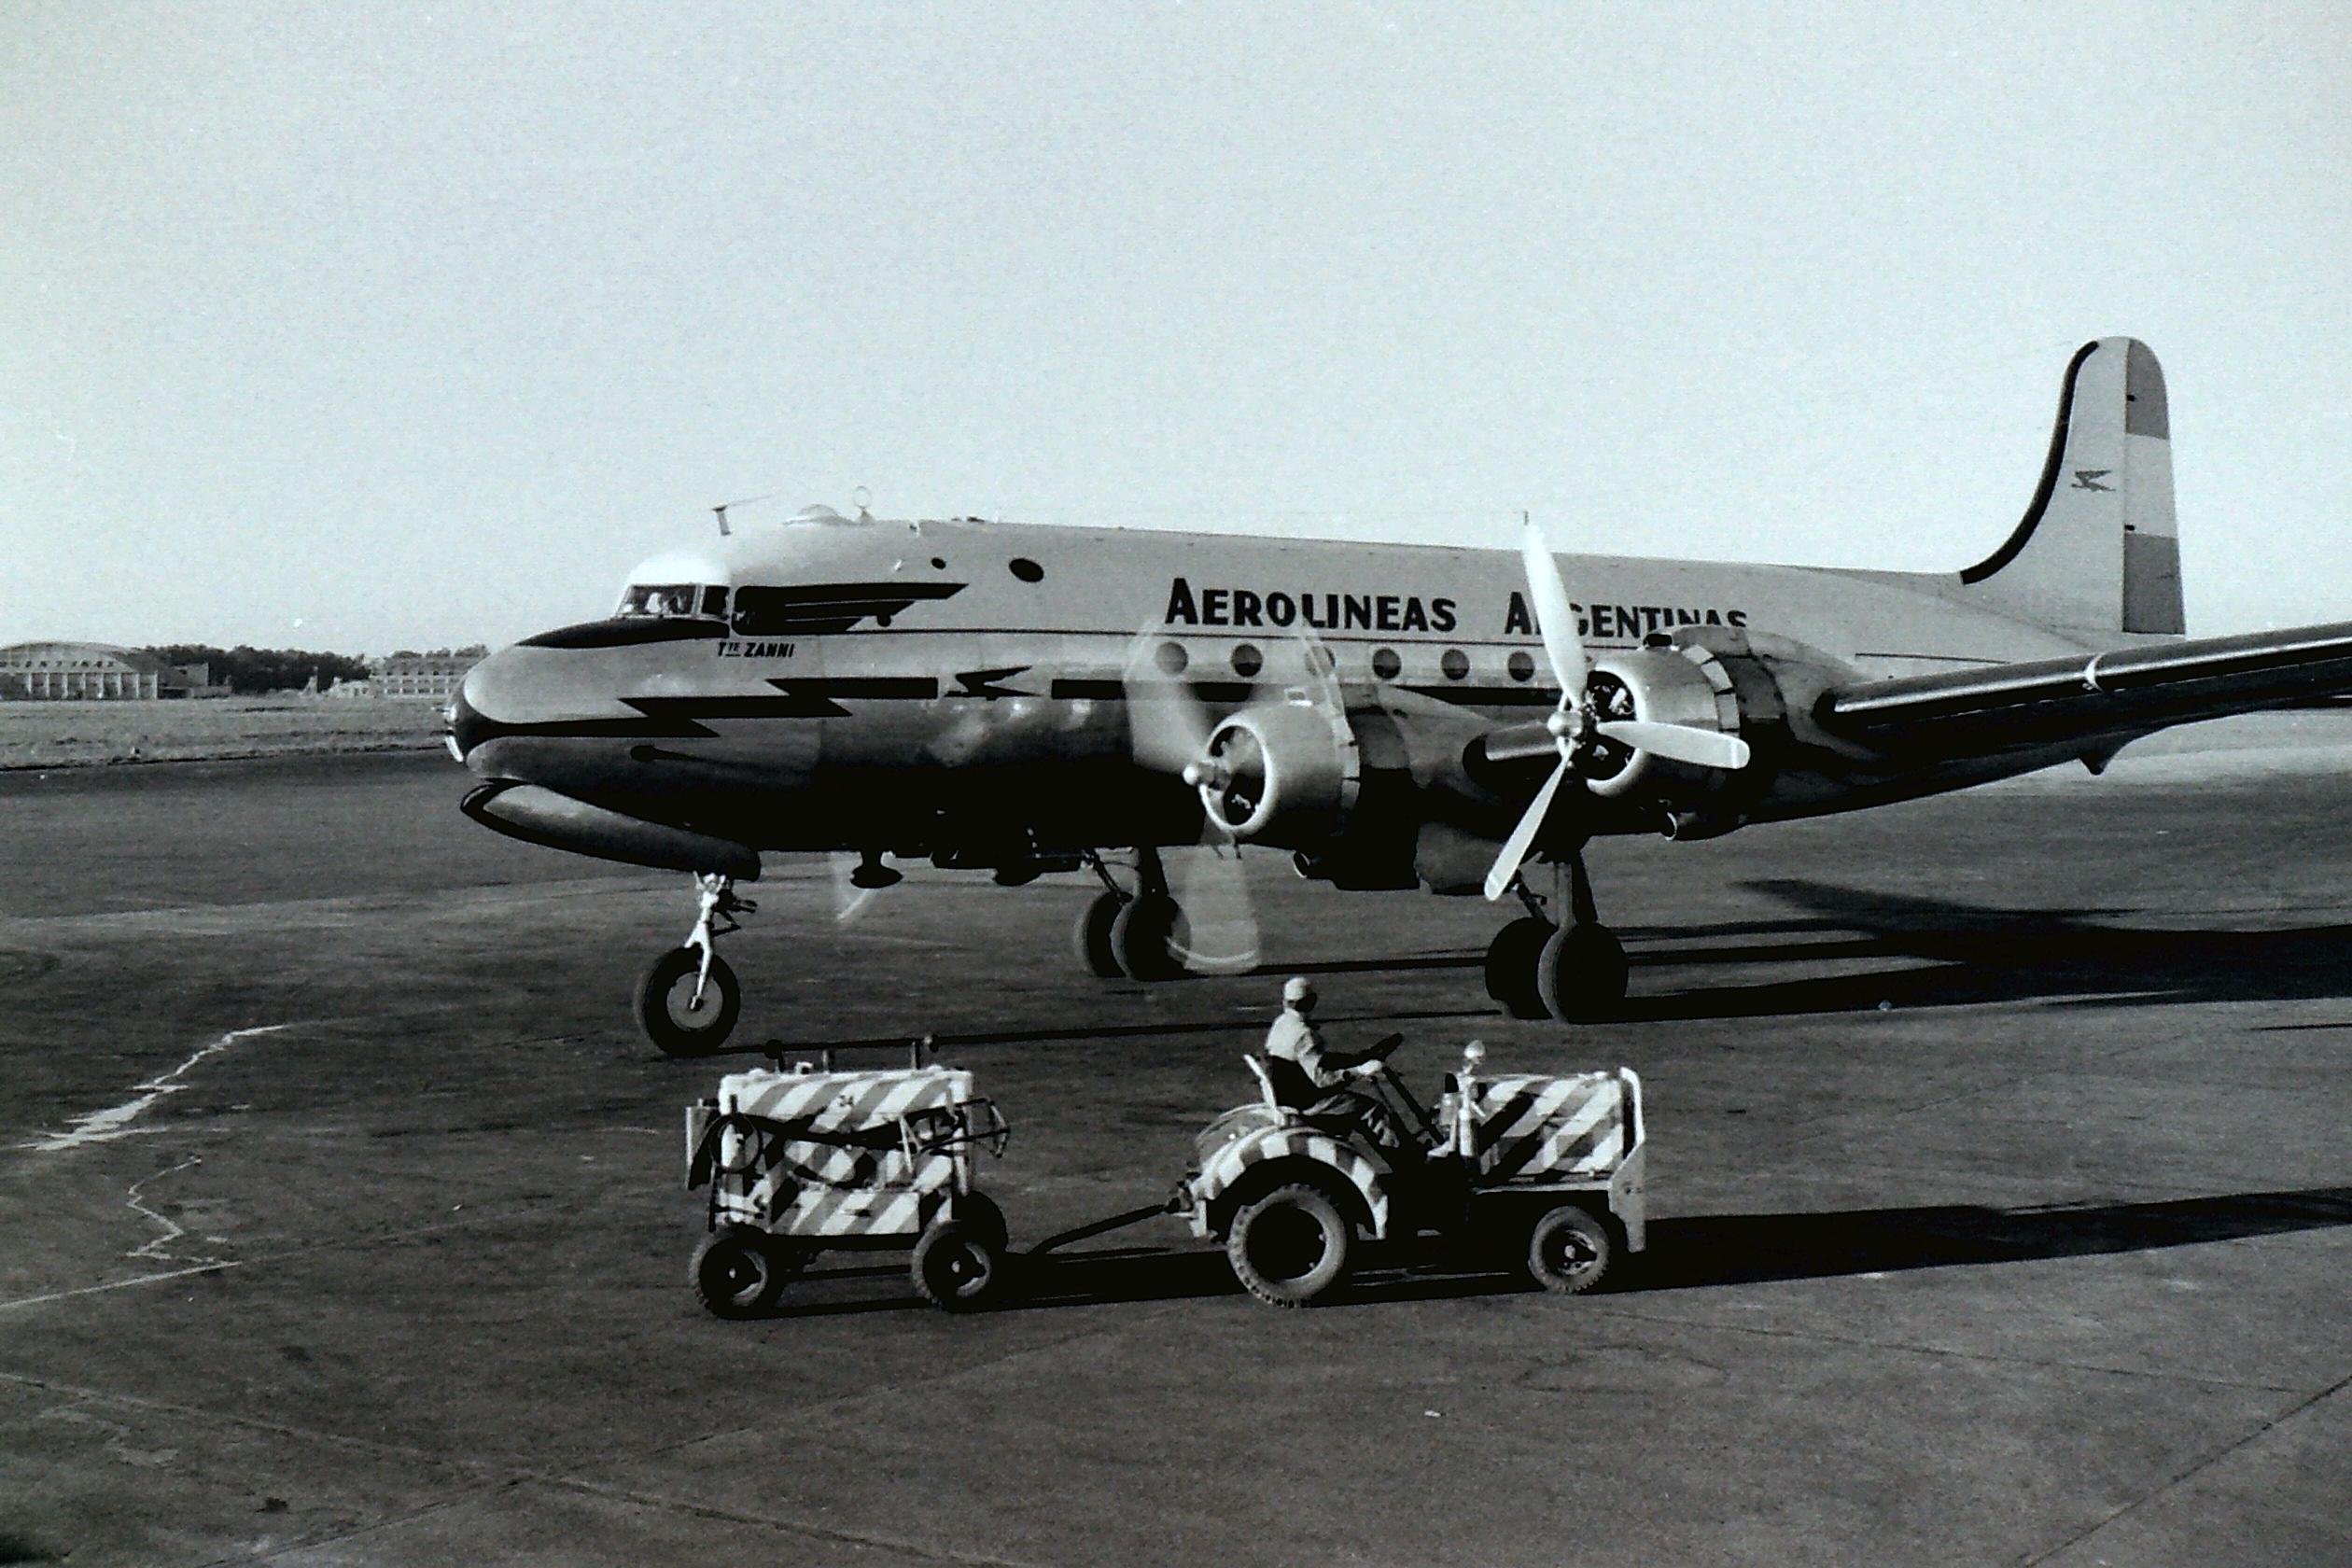 Aerolineas_Argentinas_DC4_atEZE_1958.jpg